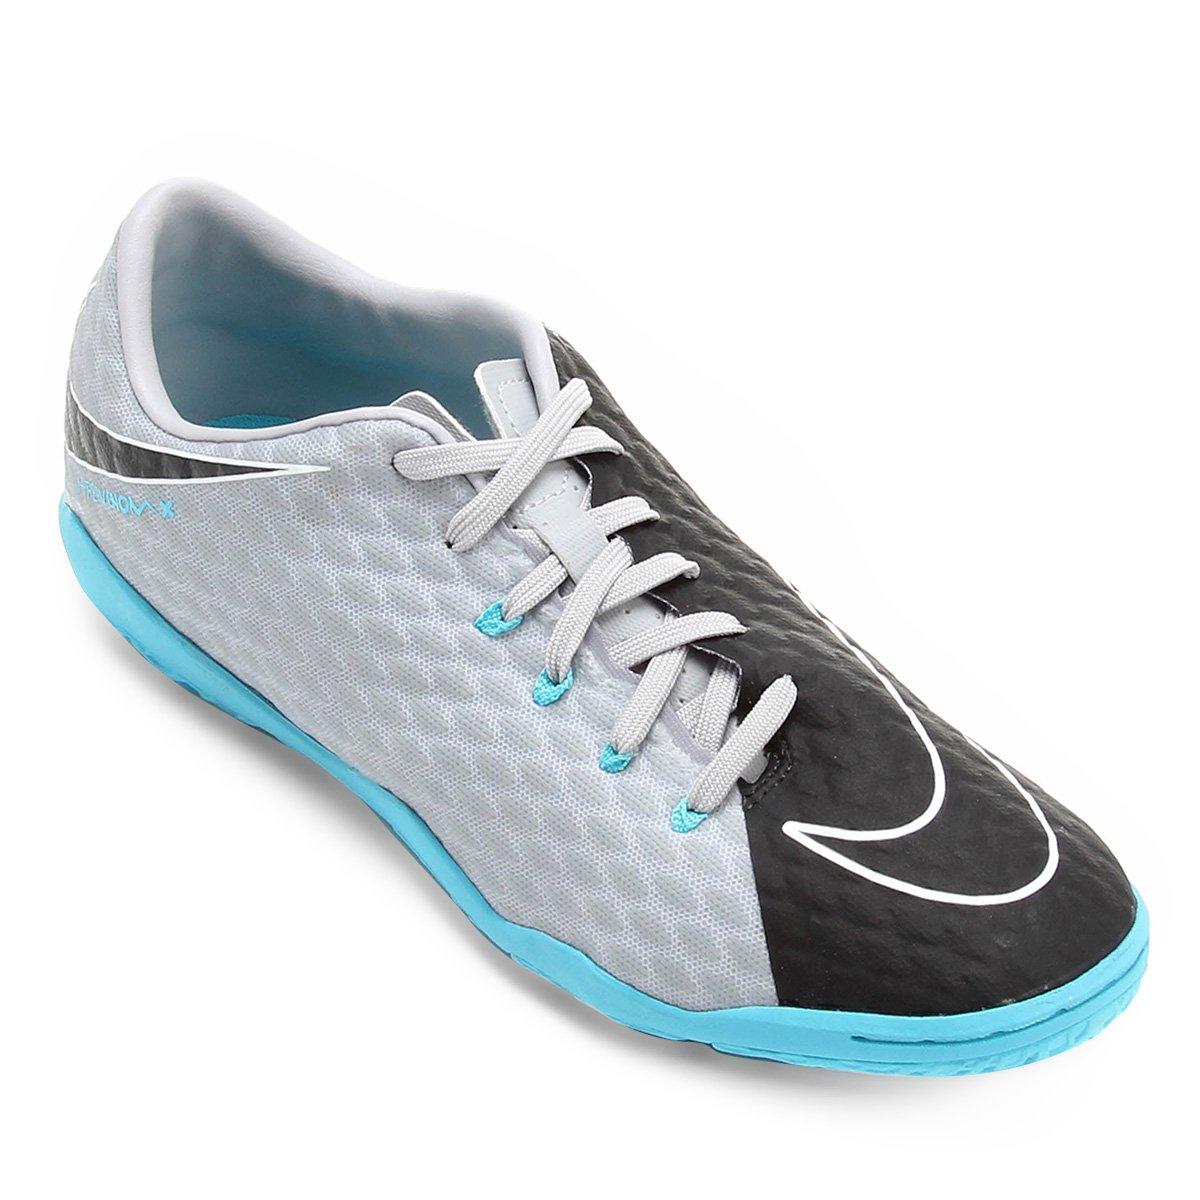 d02adf0a00 Chuteira Futsal Nike Hypervenom Phelon 3 IC